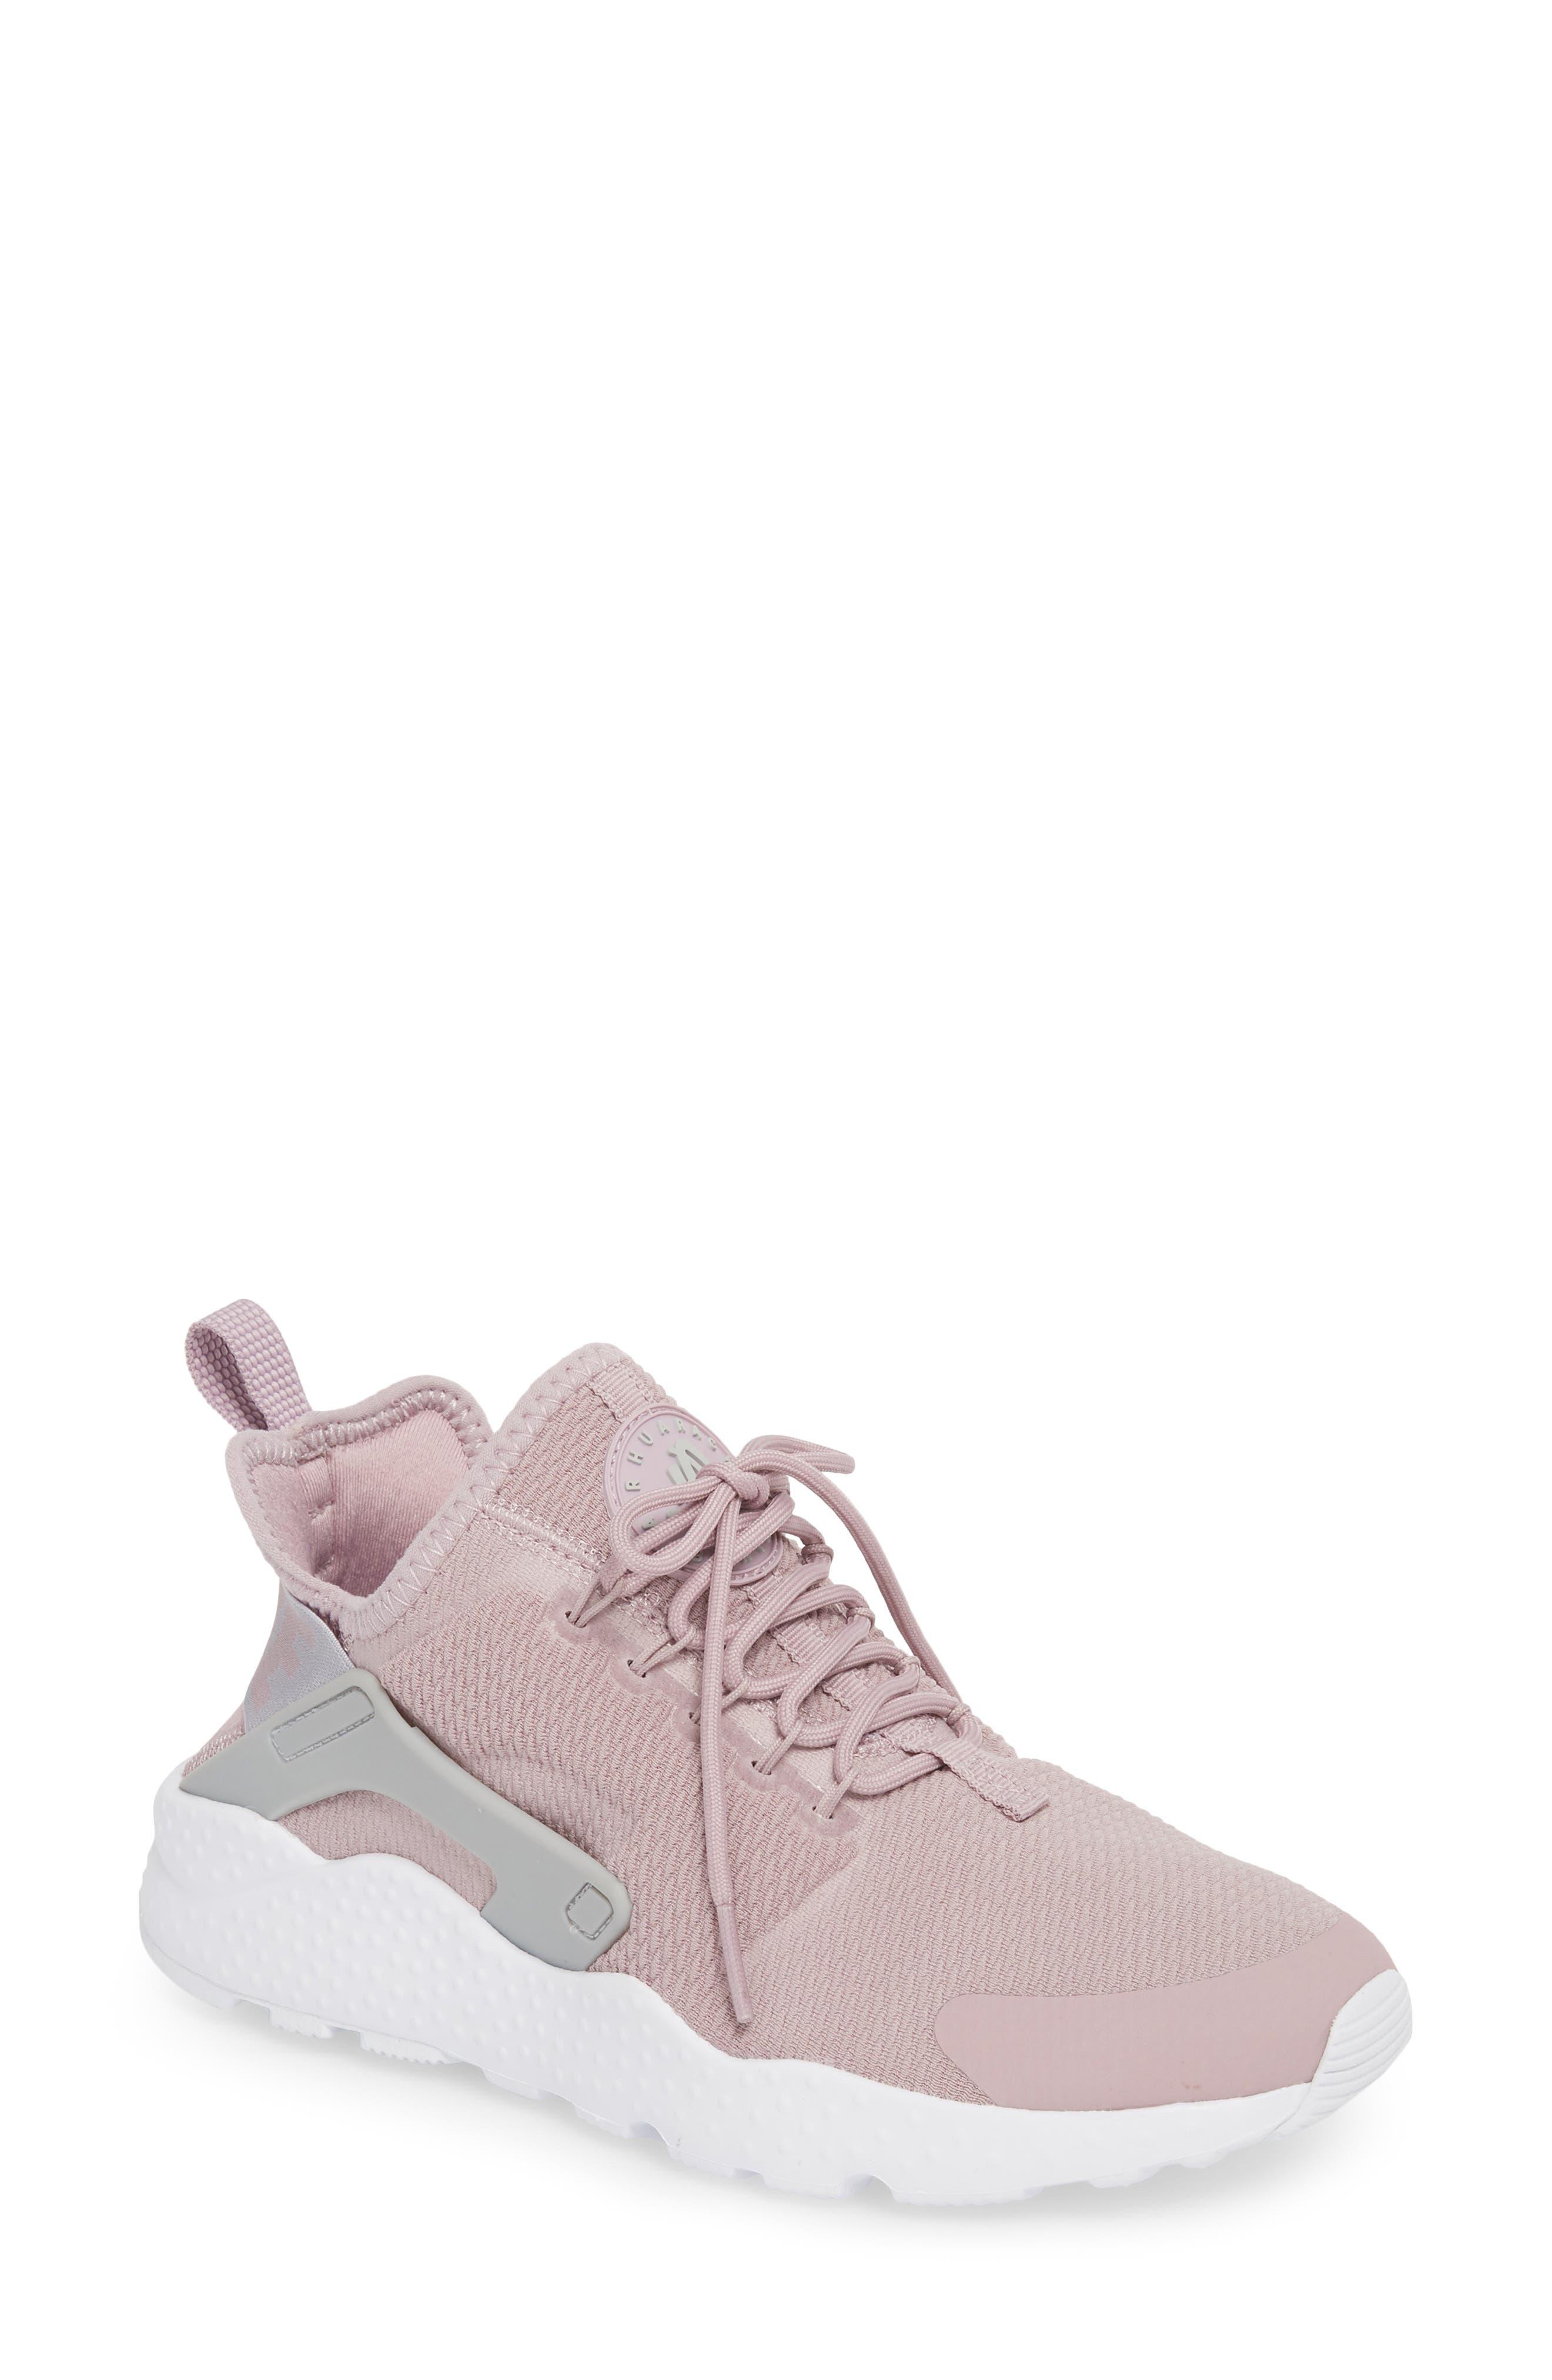 Air Huarache Sneaker,                             Main thumbnail 1, color,                             Elemental Rose/ Wolf Grey